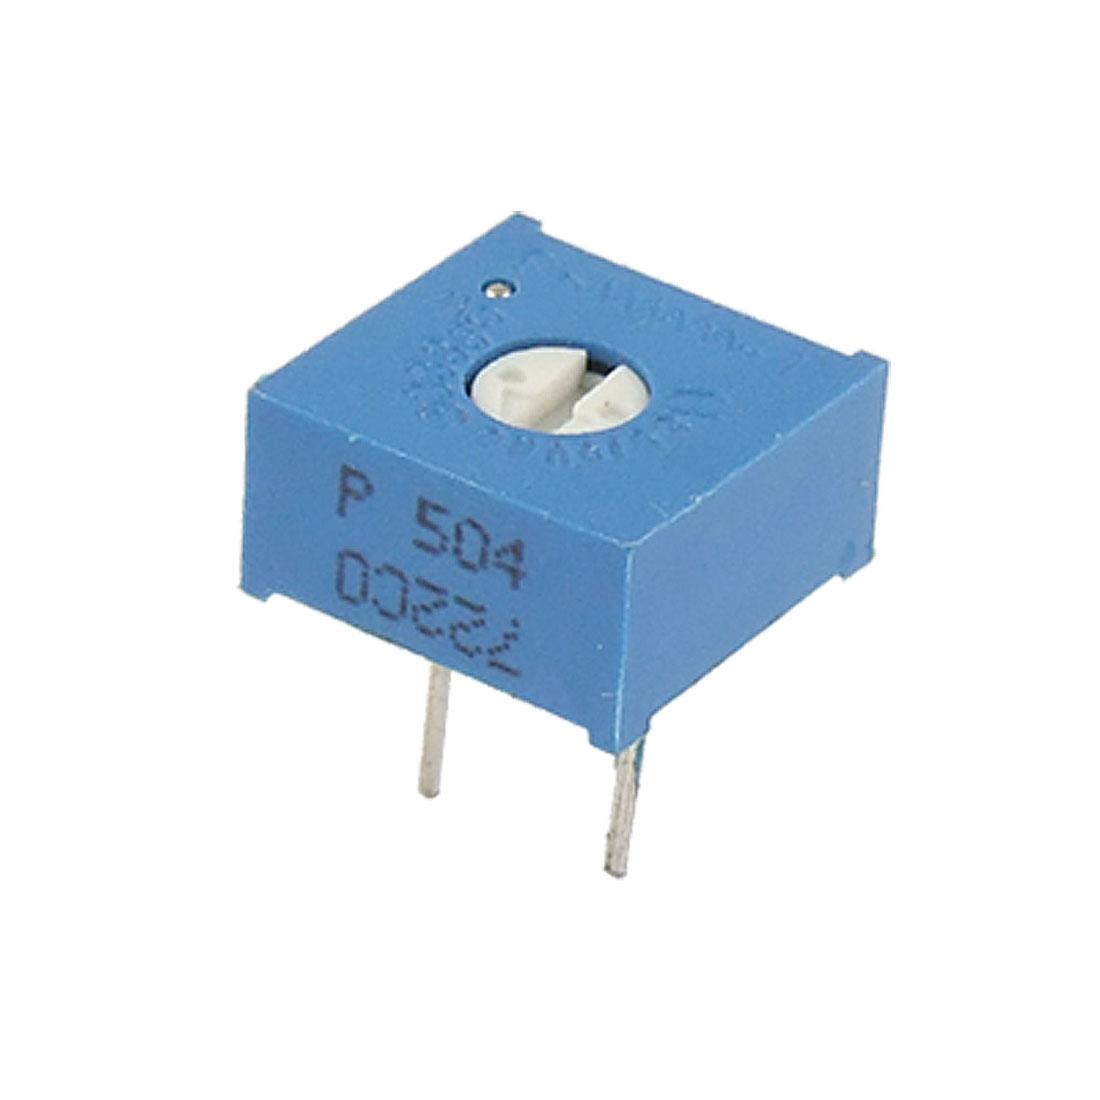 500K Ohm 500V Trimmer Cermet Variable Resistor Potentiometers 50 Pcs